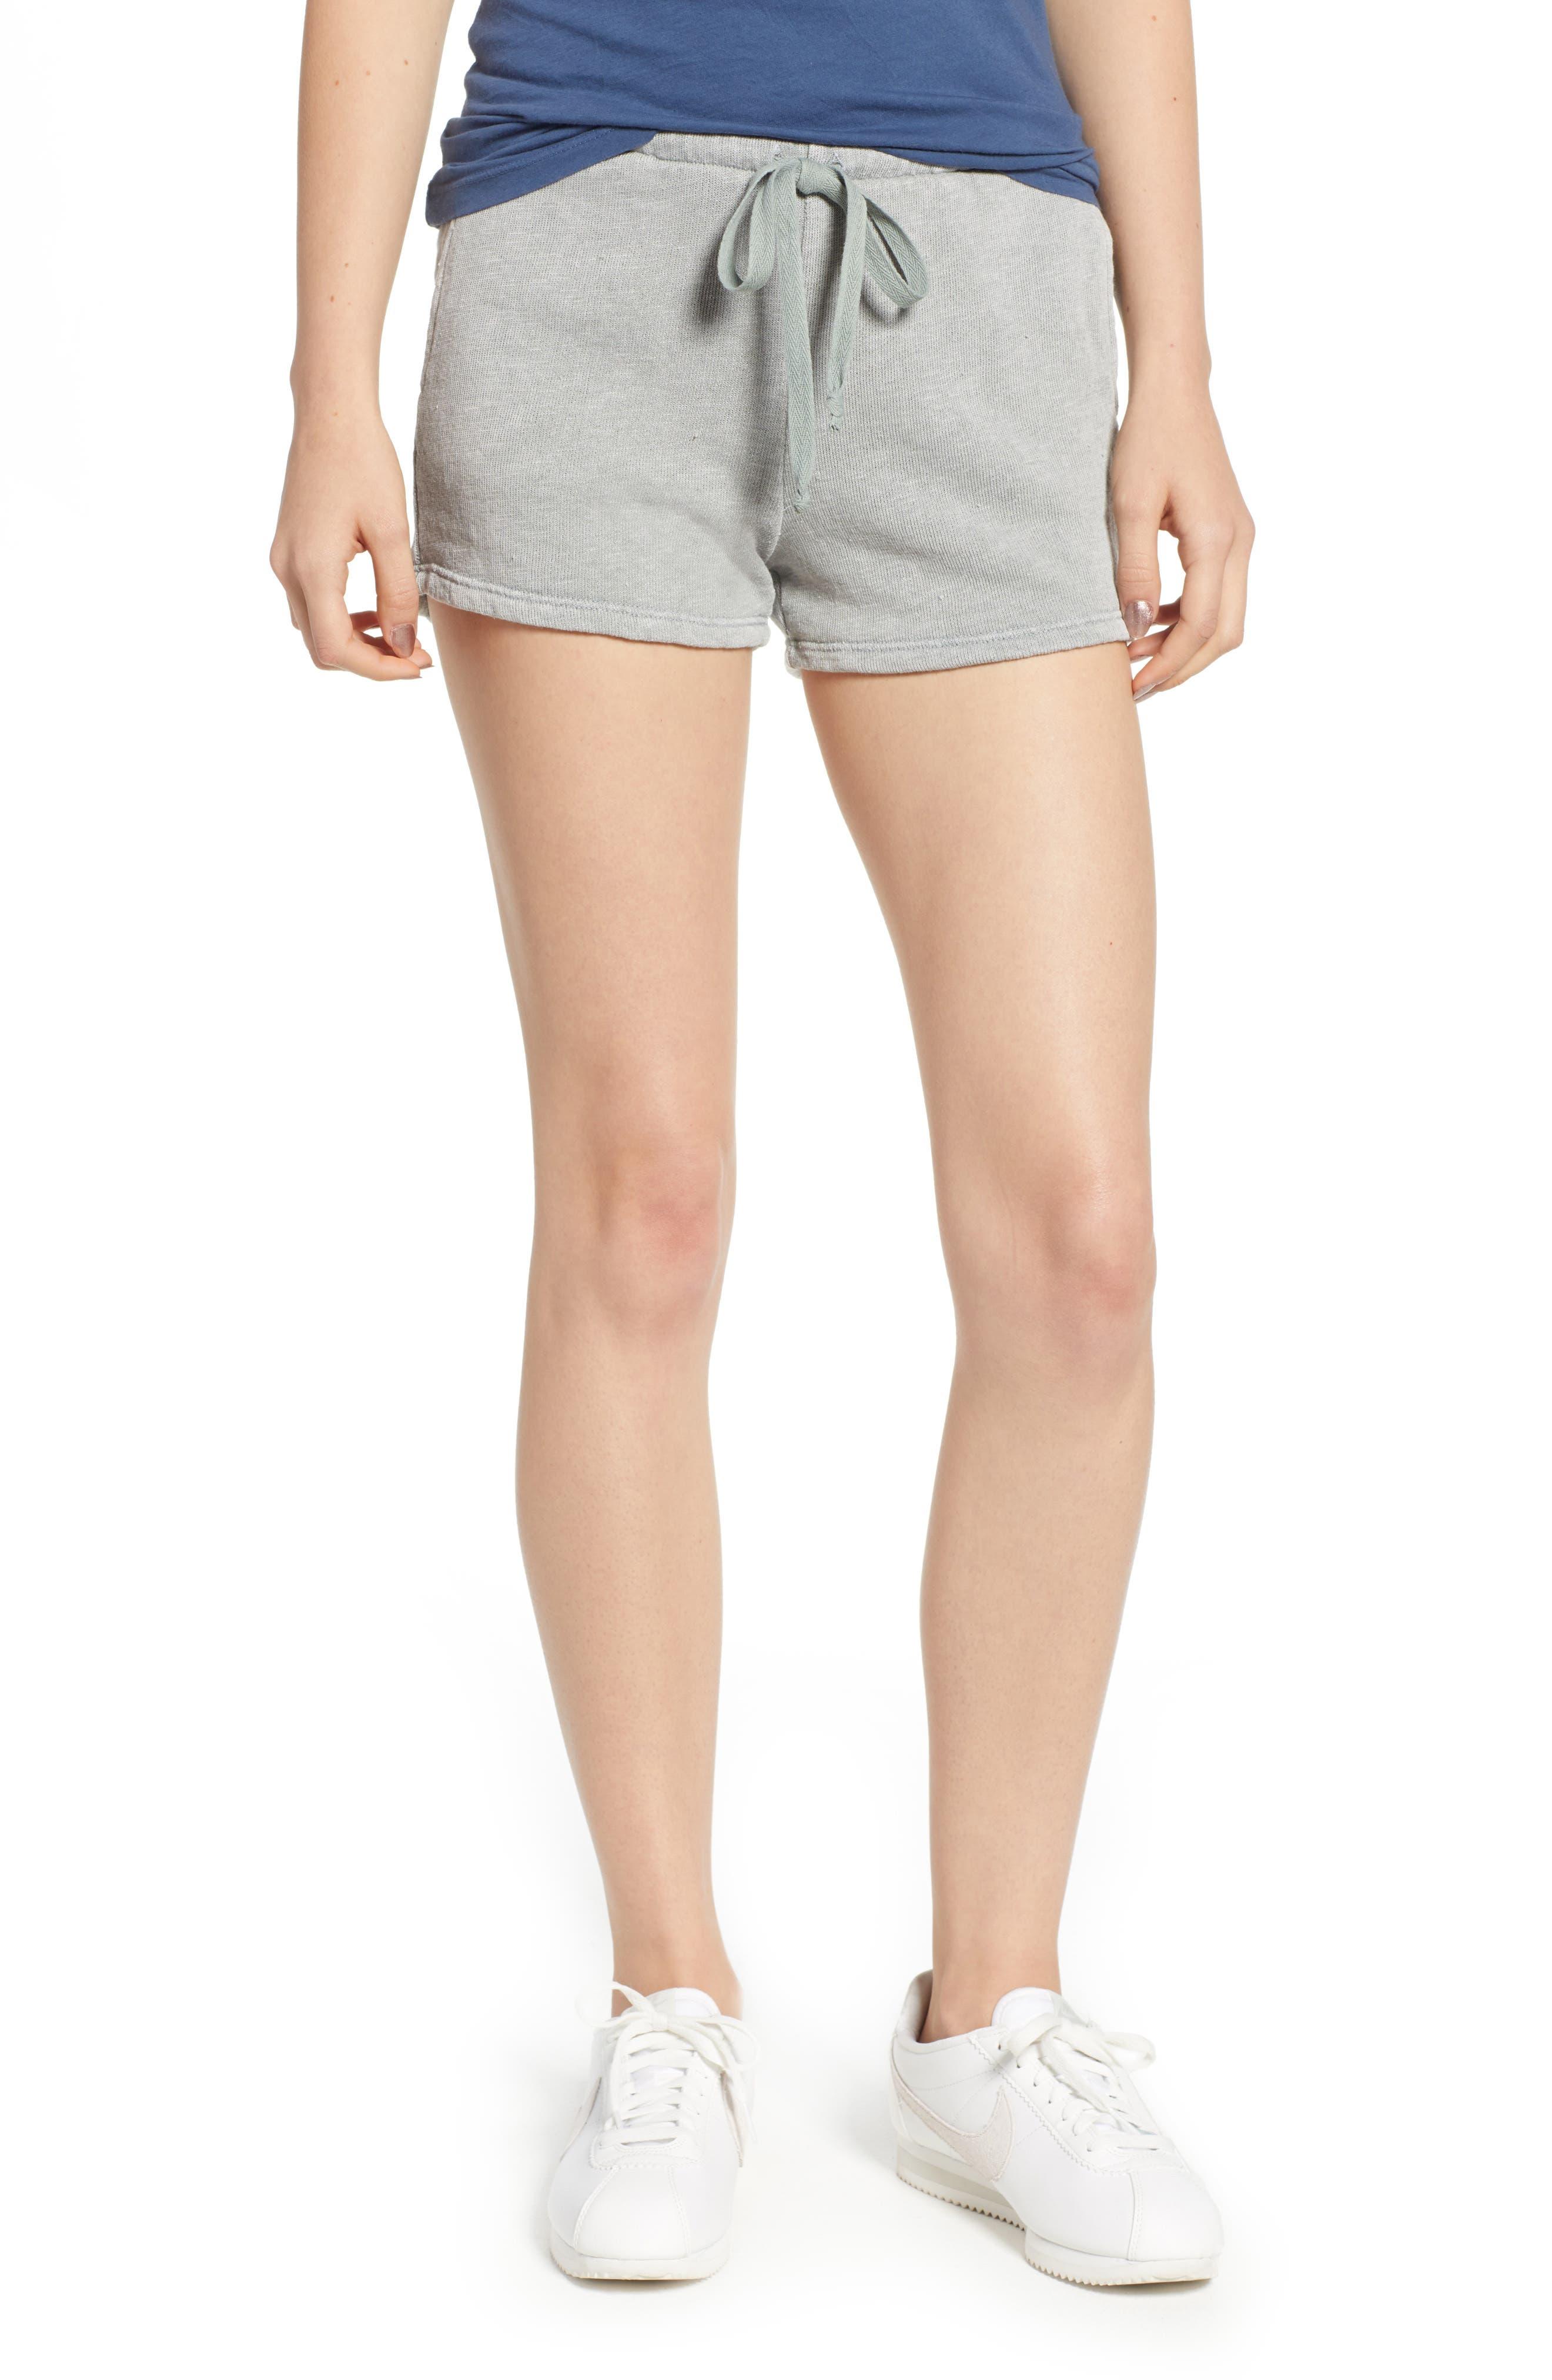 Kiama Shorts,                         Main,                         color, FADED MOSS